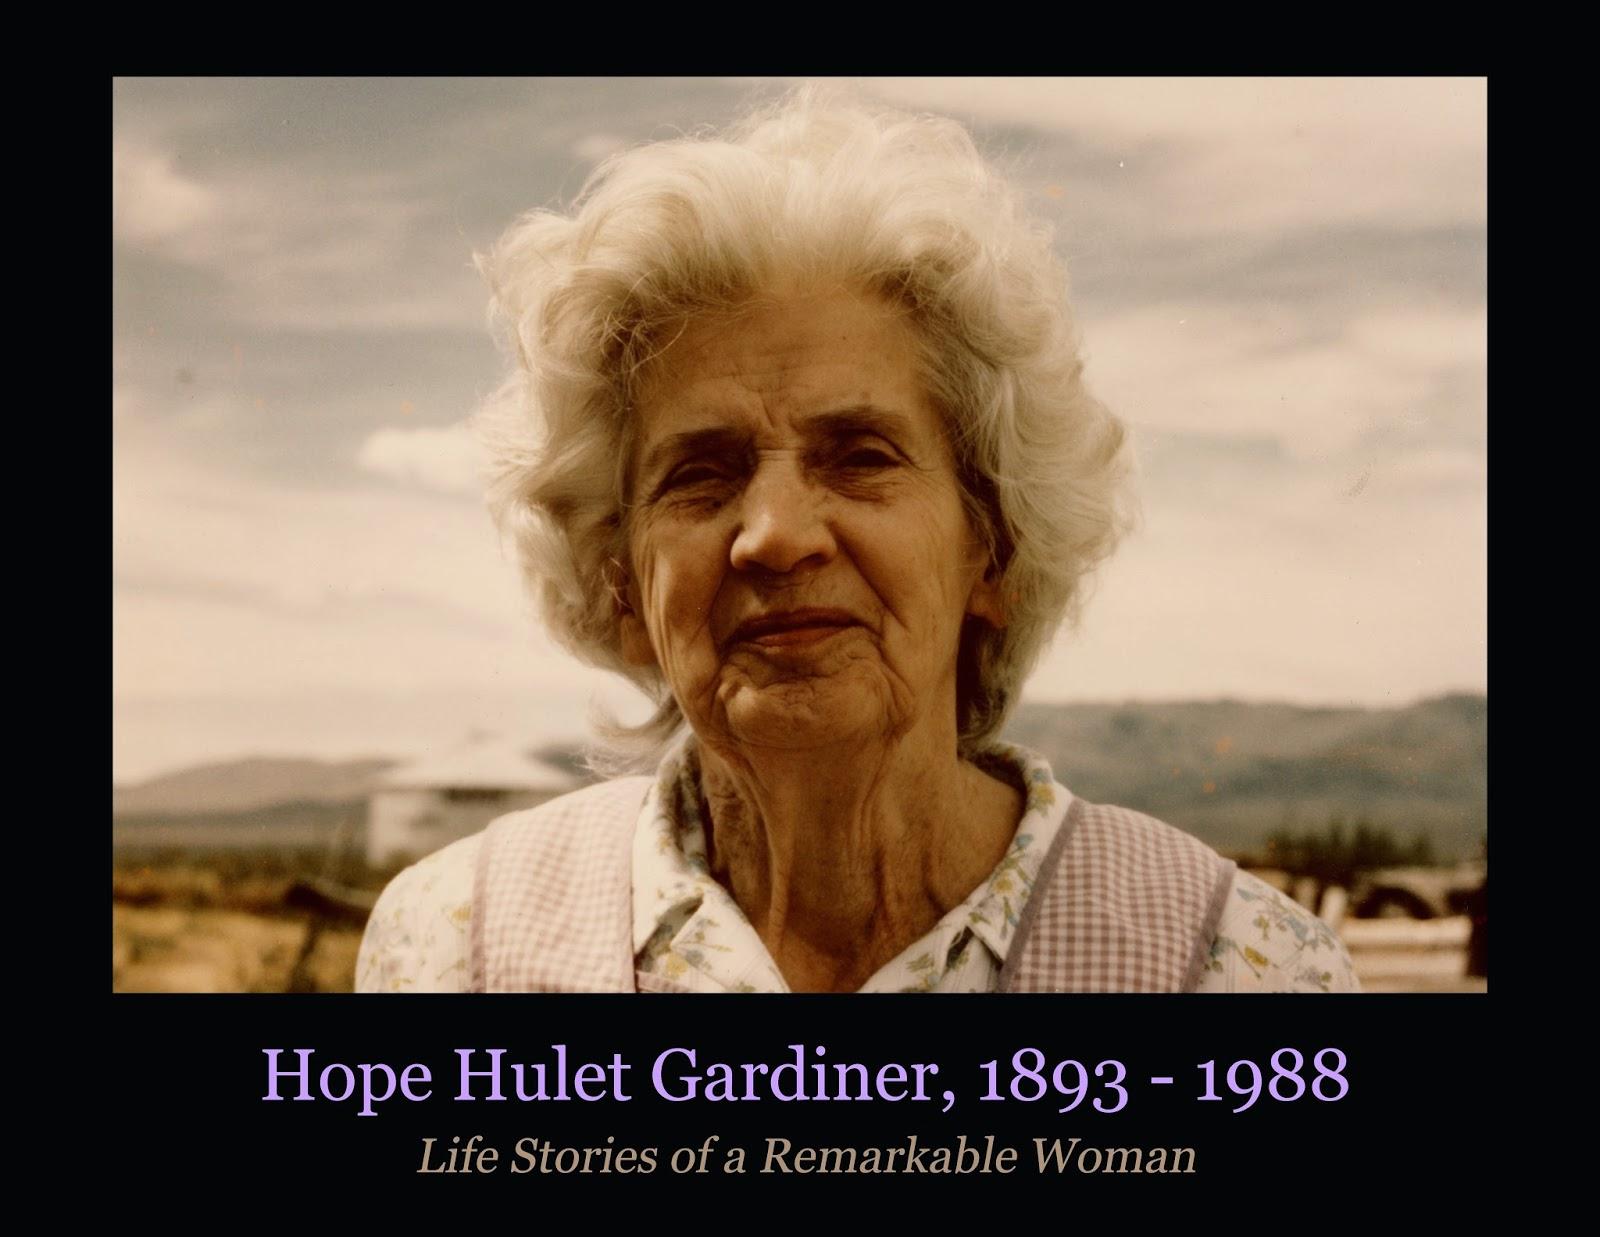 http://gatheringgardiners.blogspot.com/2014/11/hope-hulet-gardiner-1893-1988-life.html